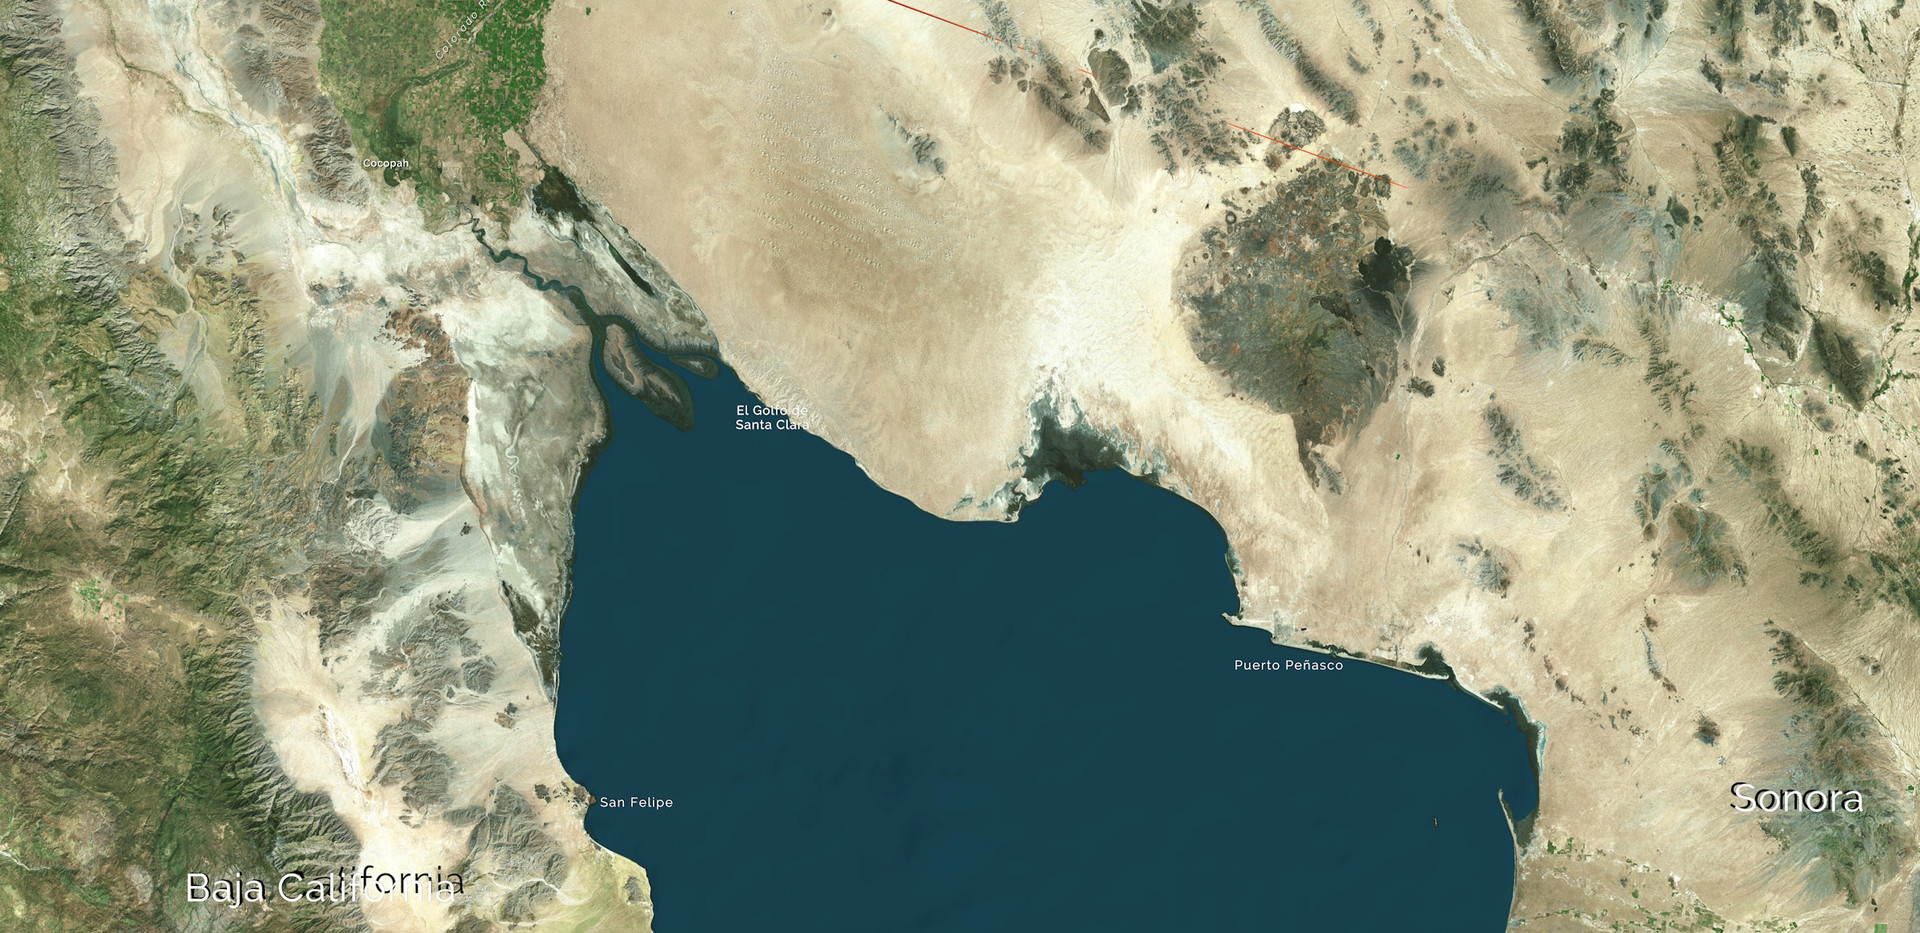 Map6_golfo_region.jpg